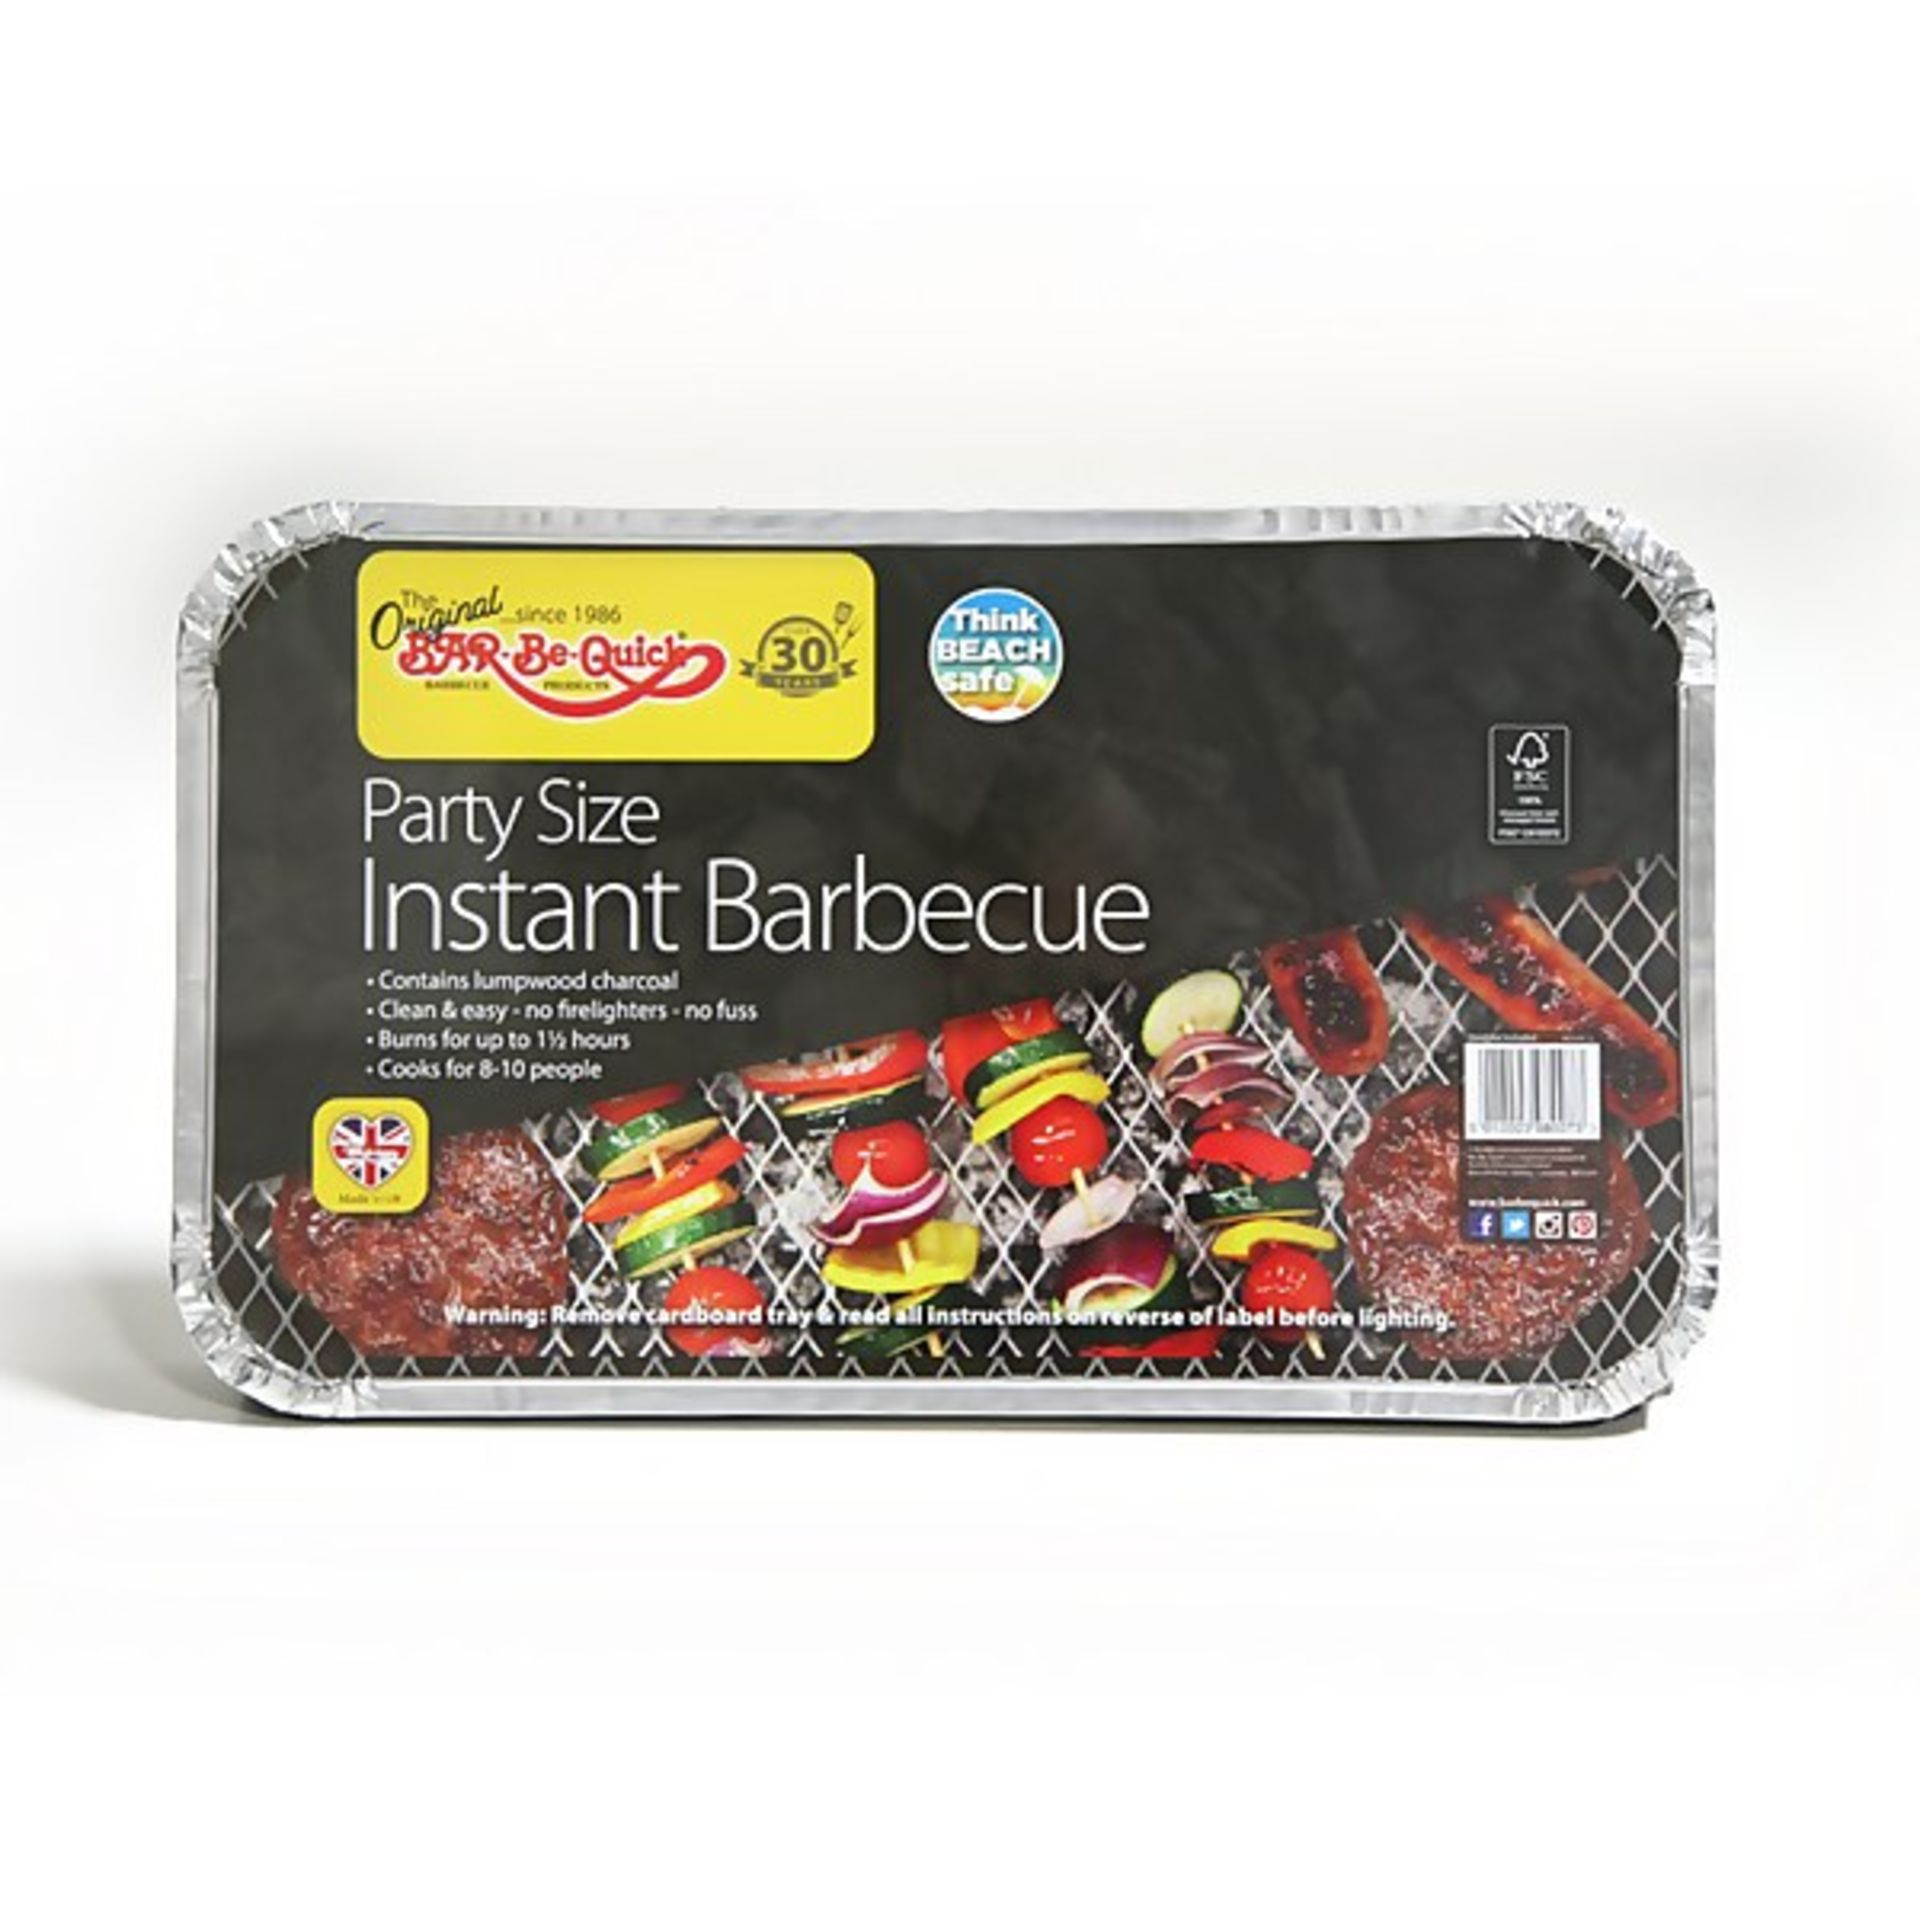 (3H) 4x BBQ Items. 1x Expert Grill The Big Portable Grill. 1x Expert Grill 75cm Barrell BBQ. 1x - Image 4 of 9